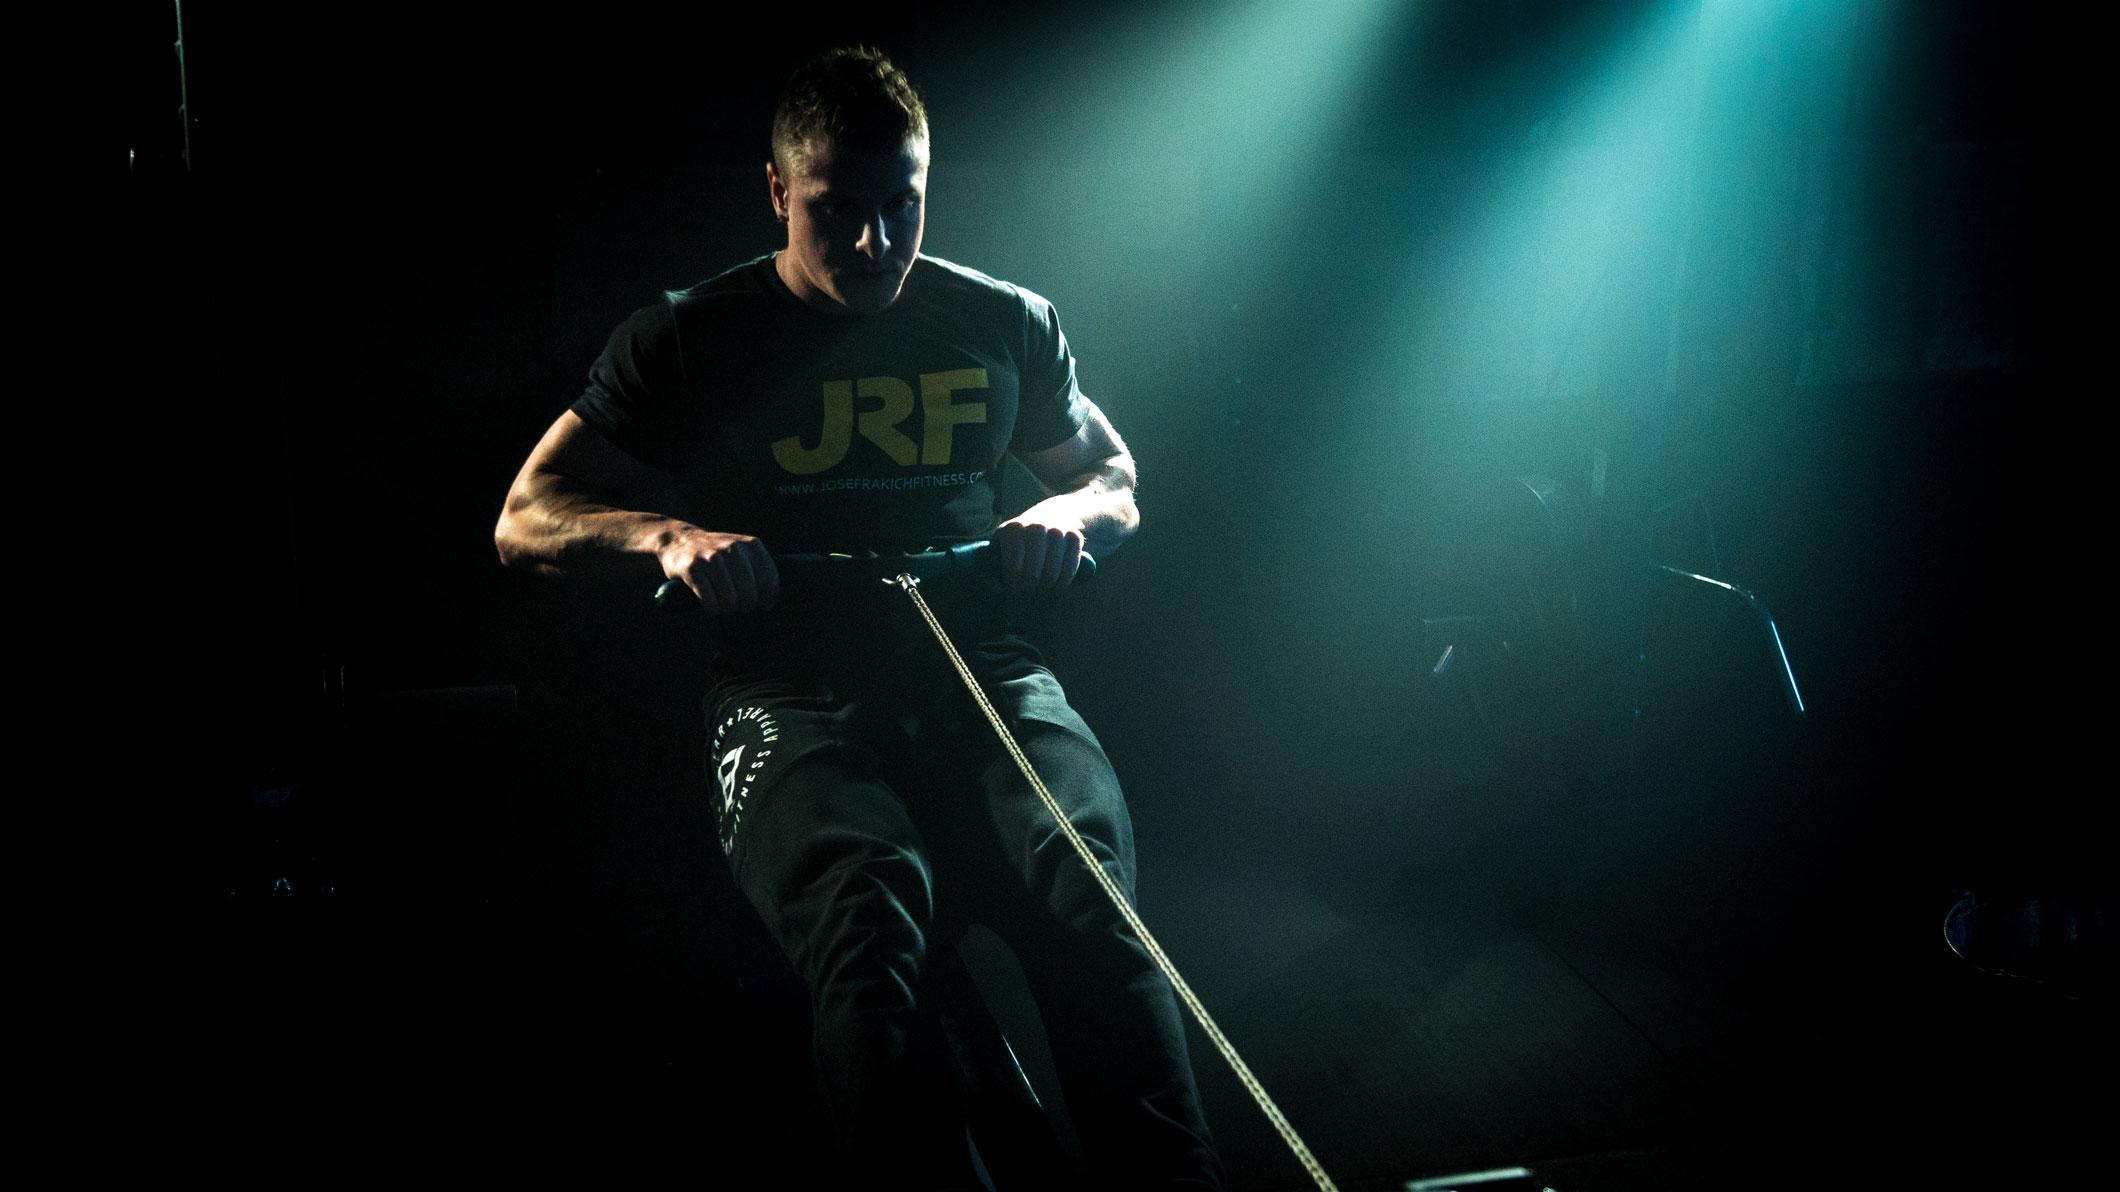 Copyright_OnepostLTD_Photography_jrf1